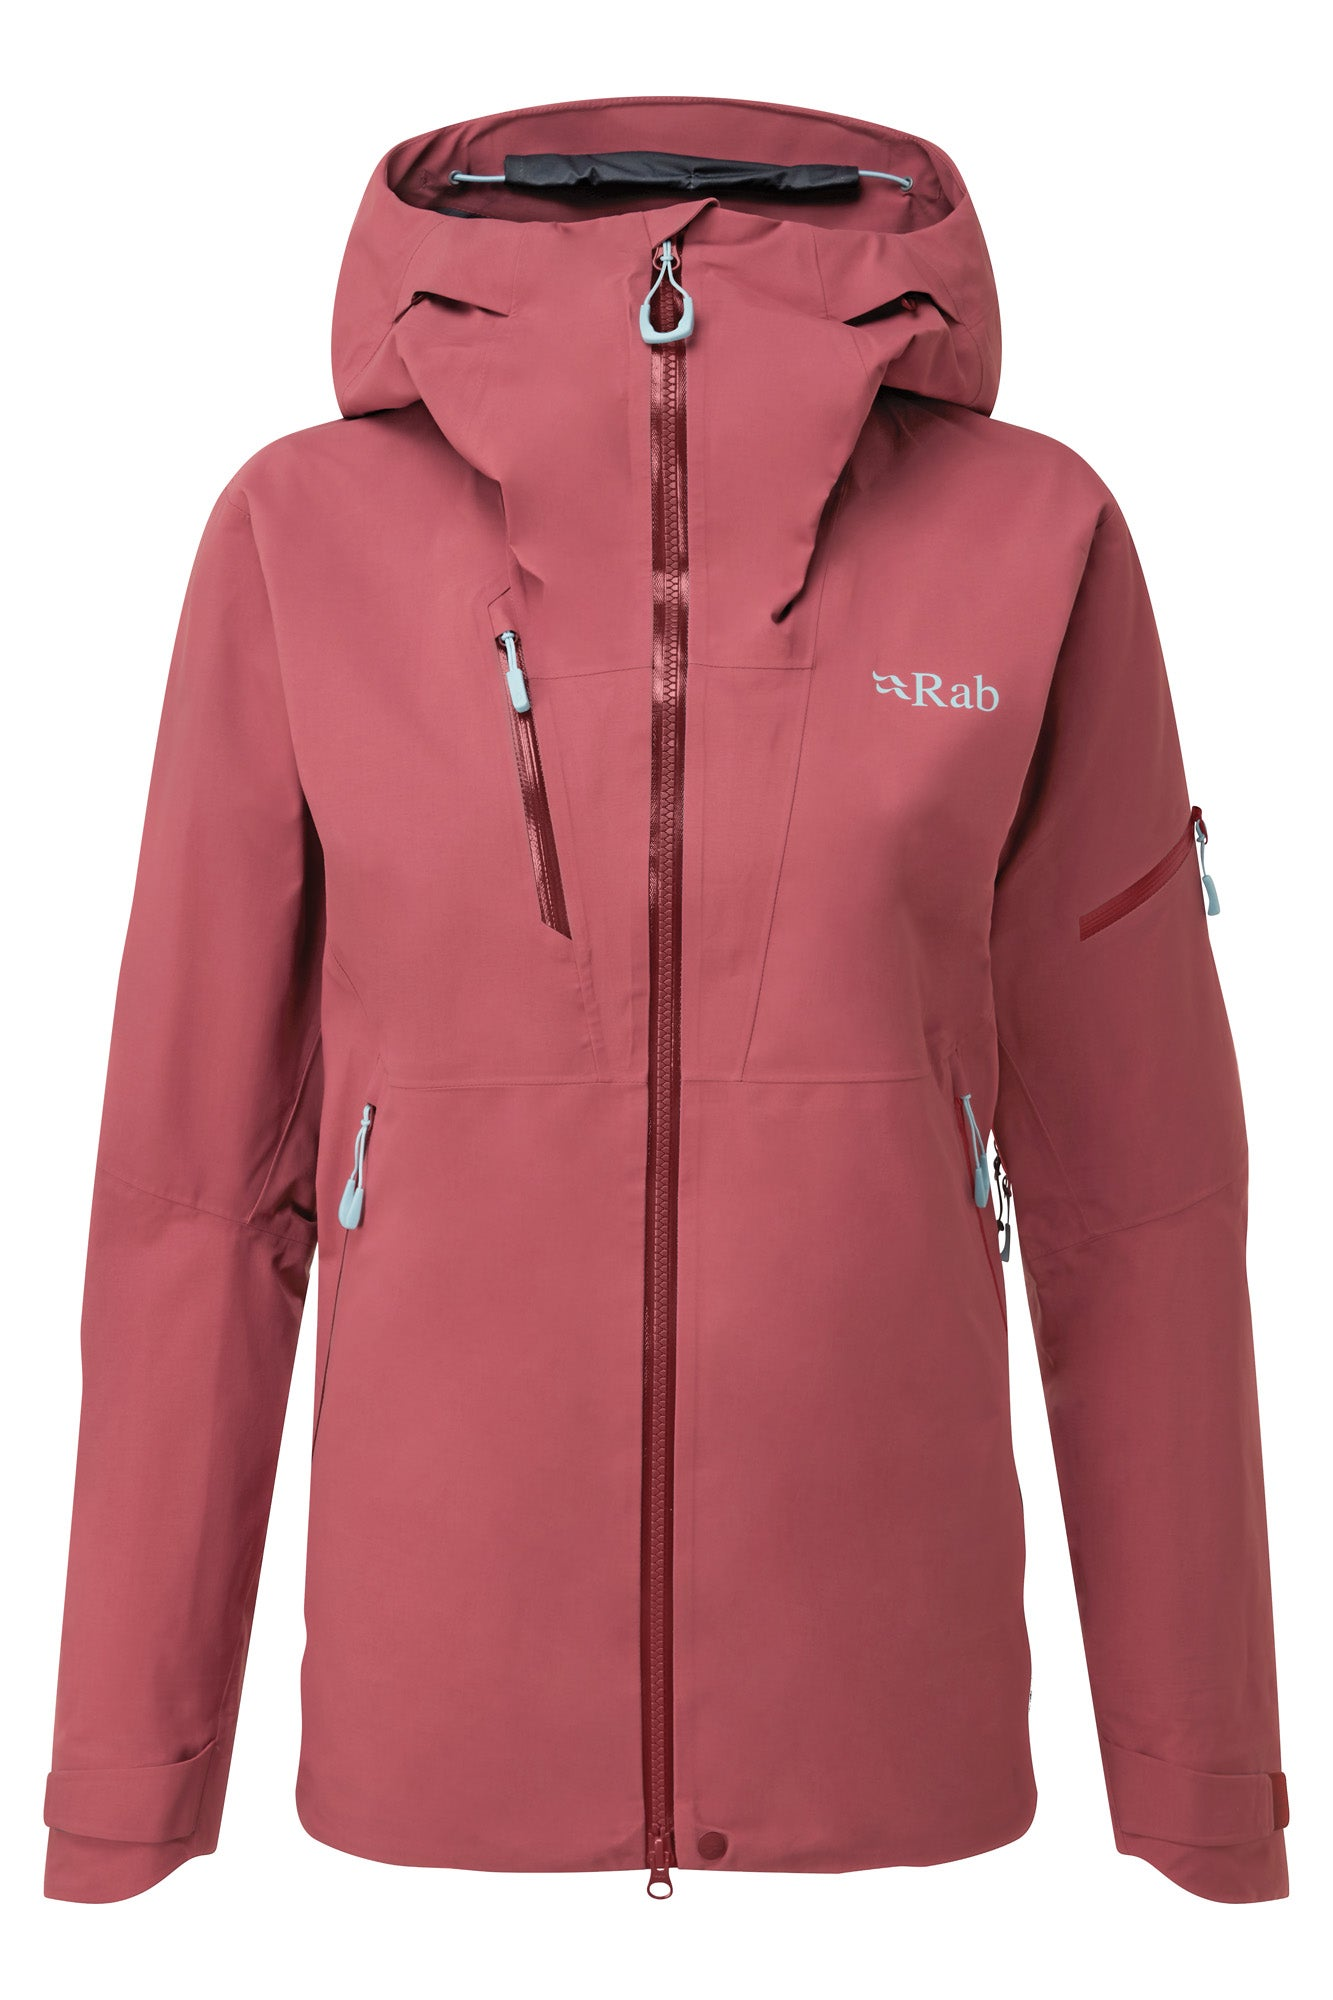 Women's Rab Khroma GTX Ski Jacket